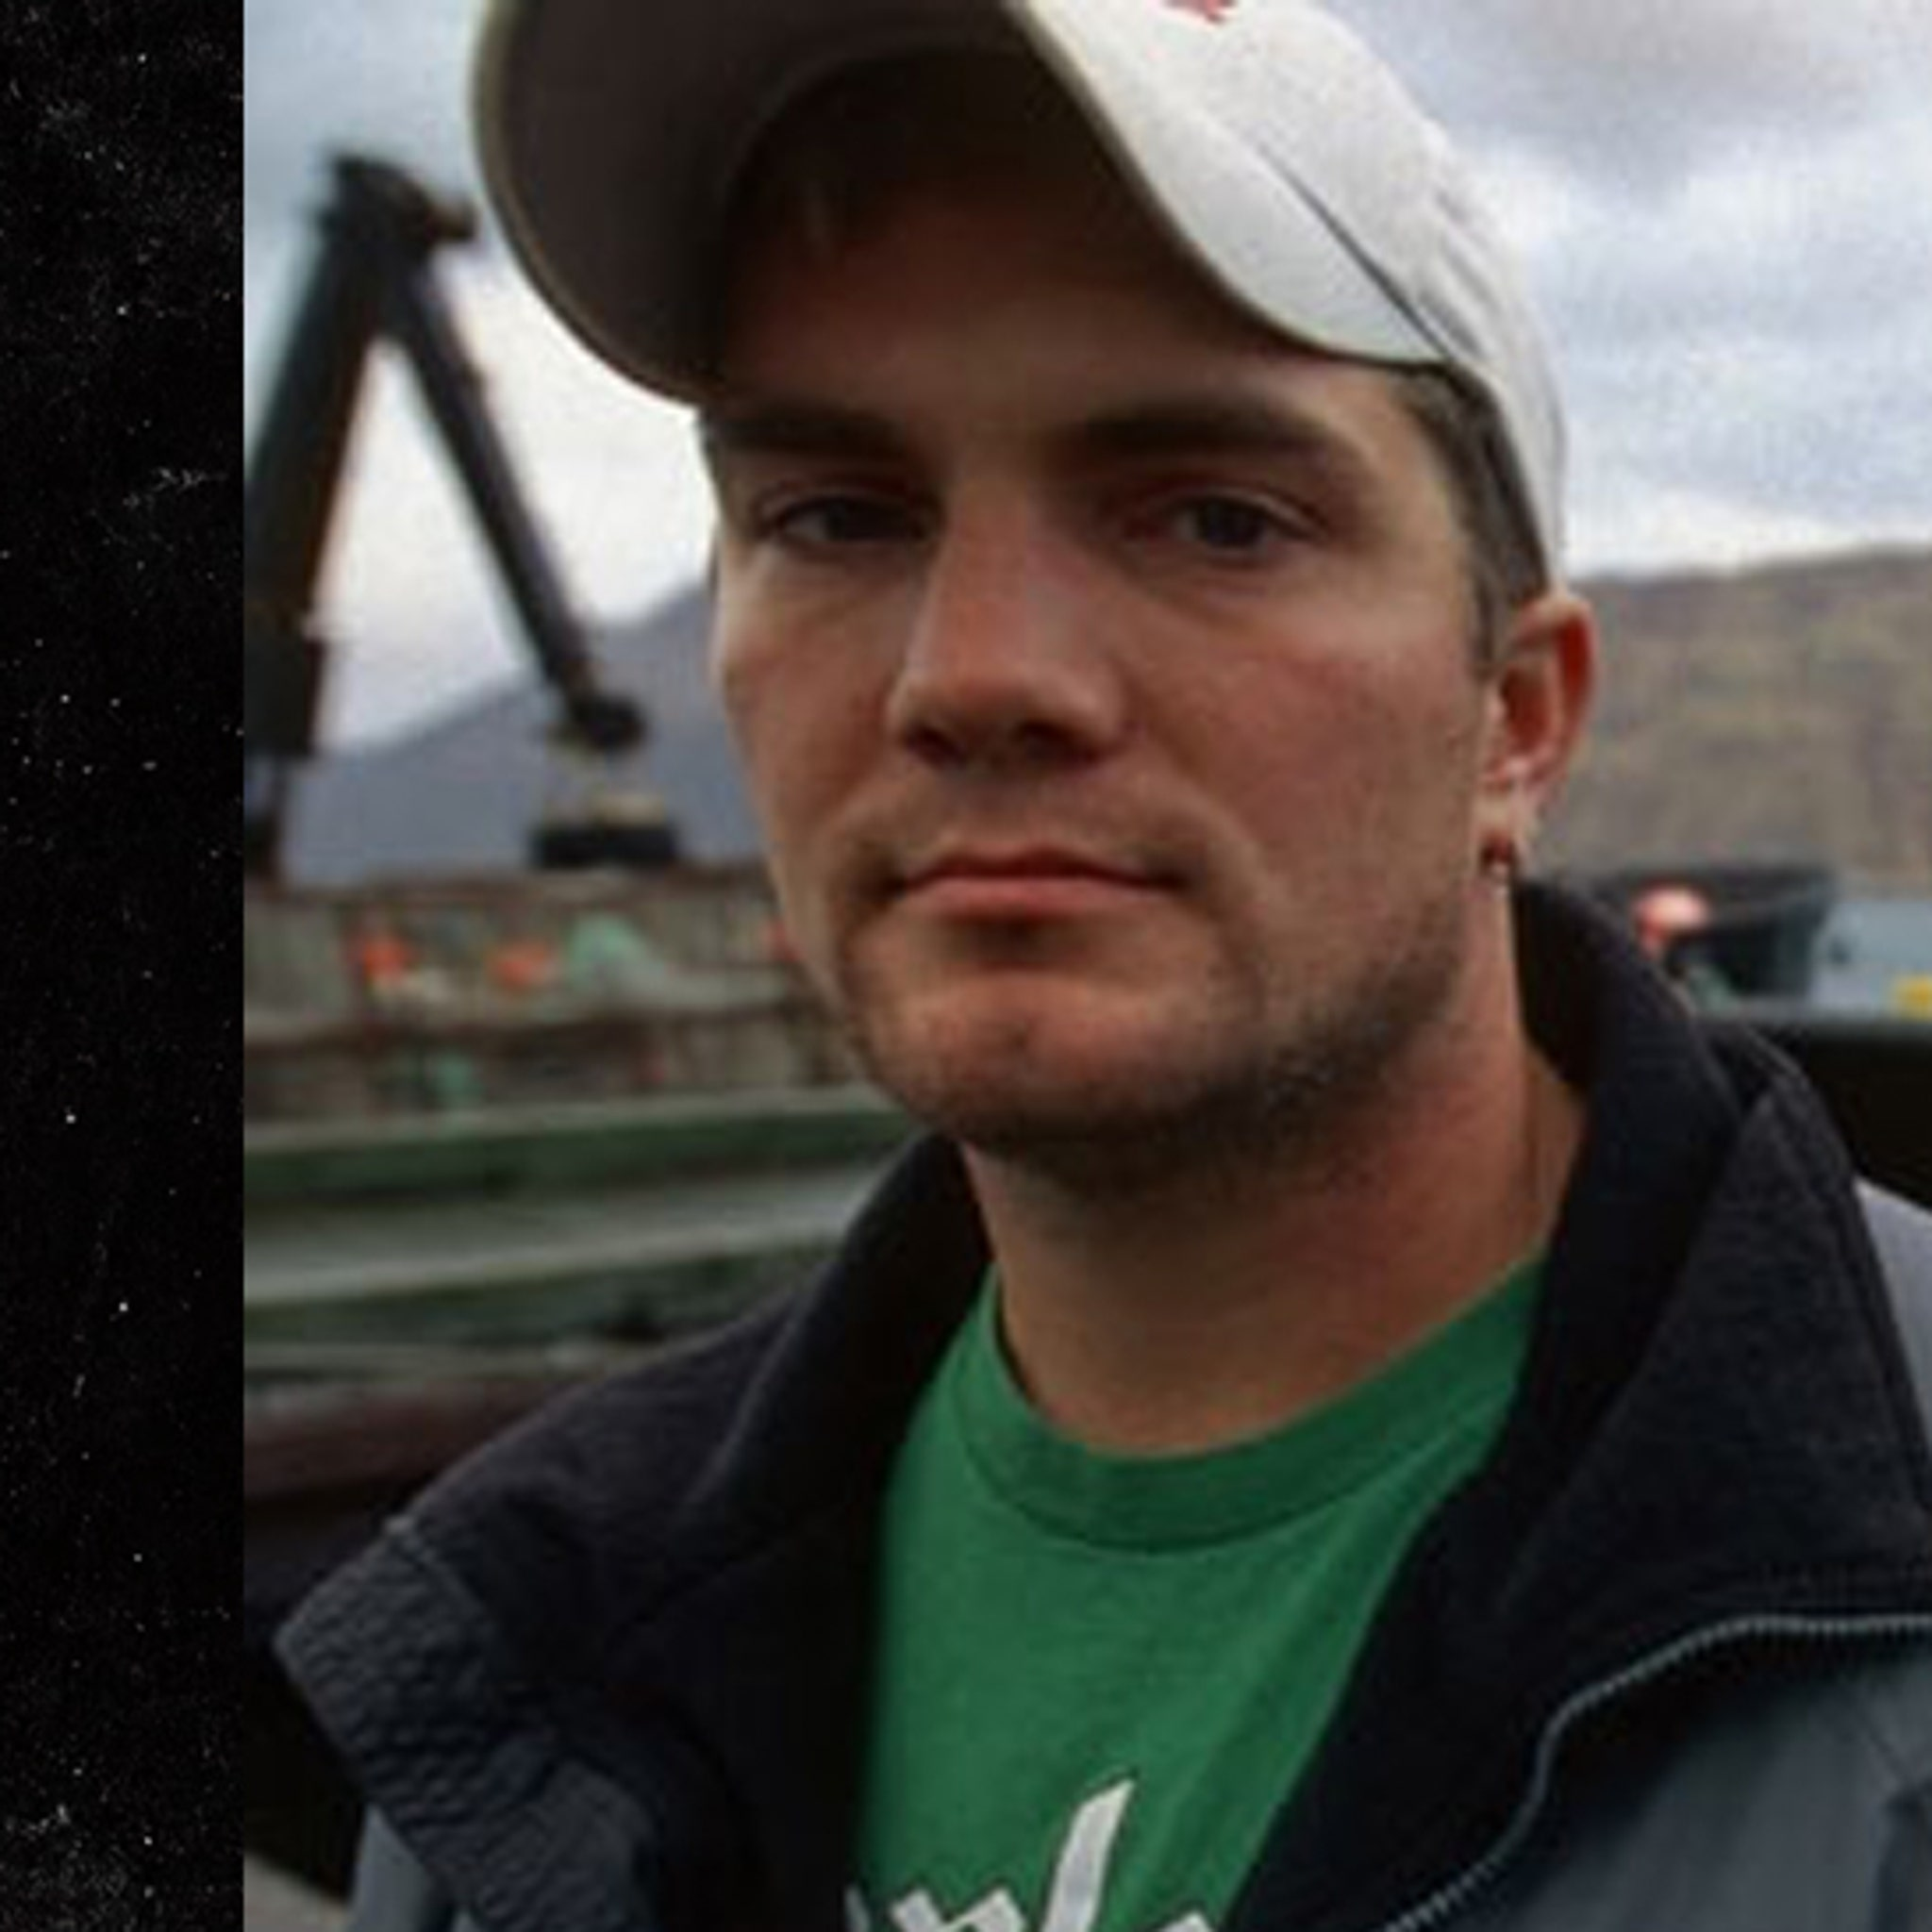 Deadliest Catch' Captain Blake Painter Dies